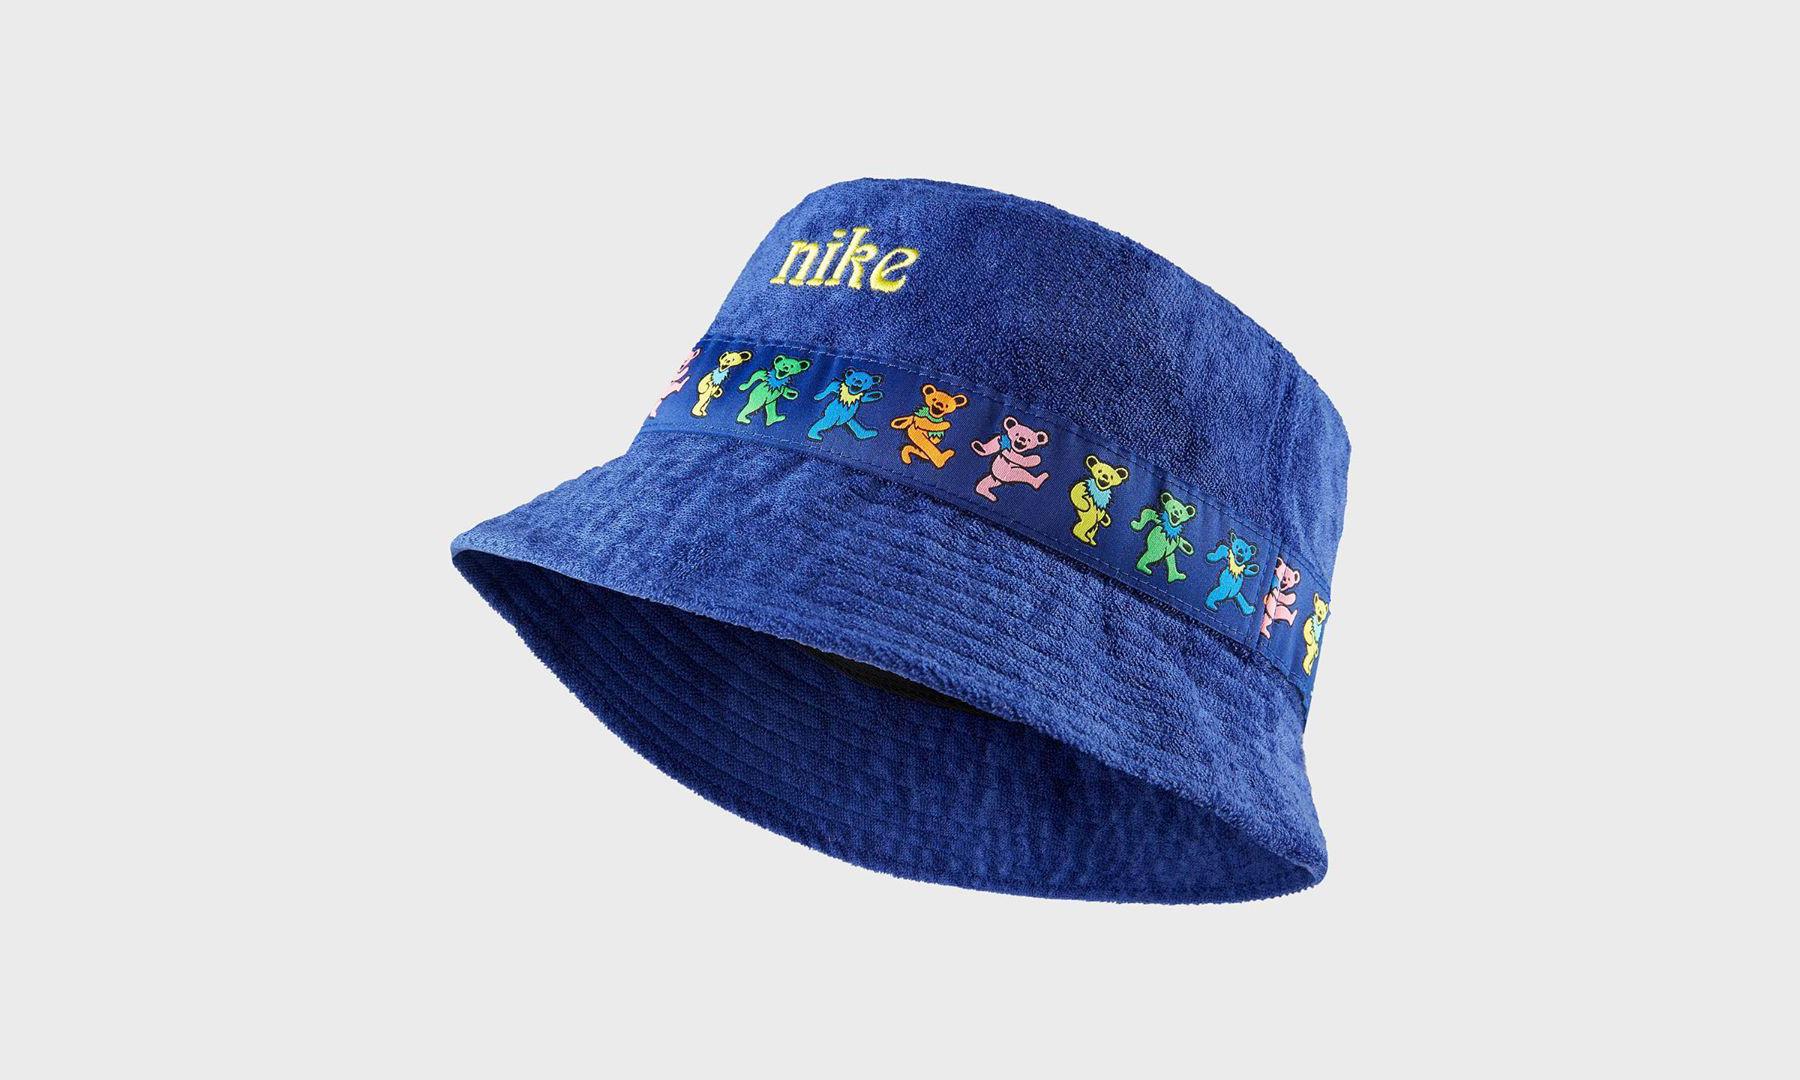 Grateful Dead x Nike 联名系列还有款帽发售